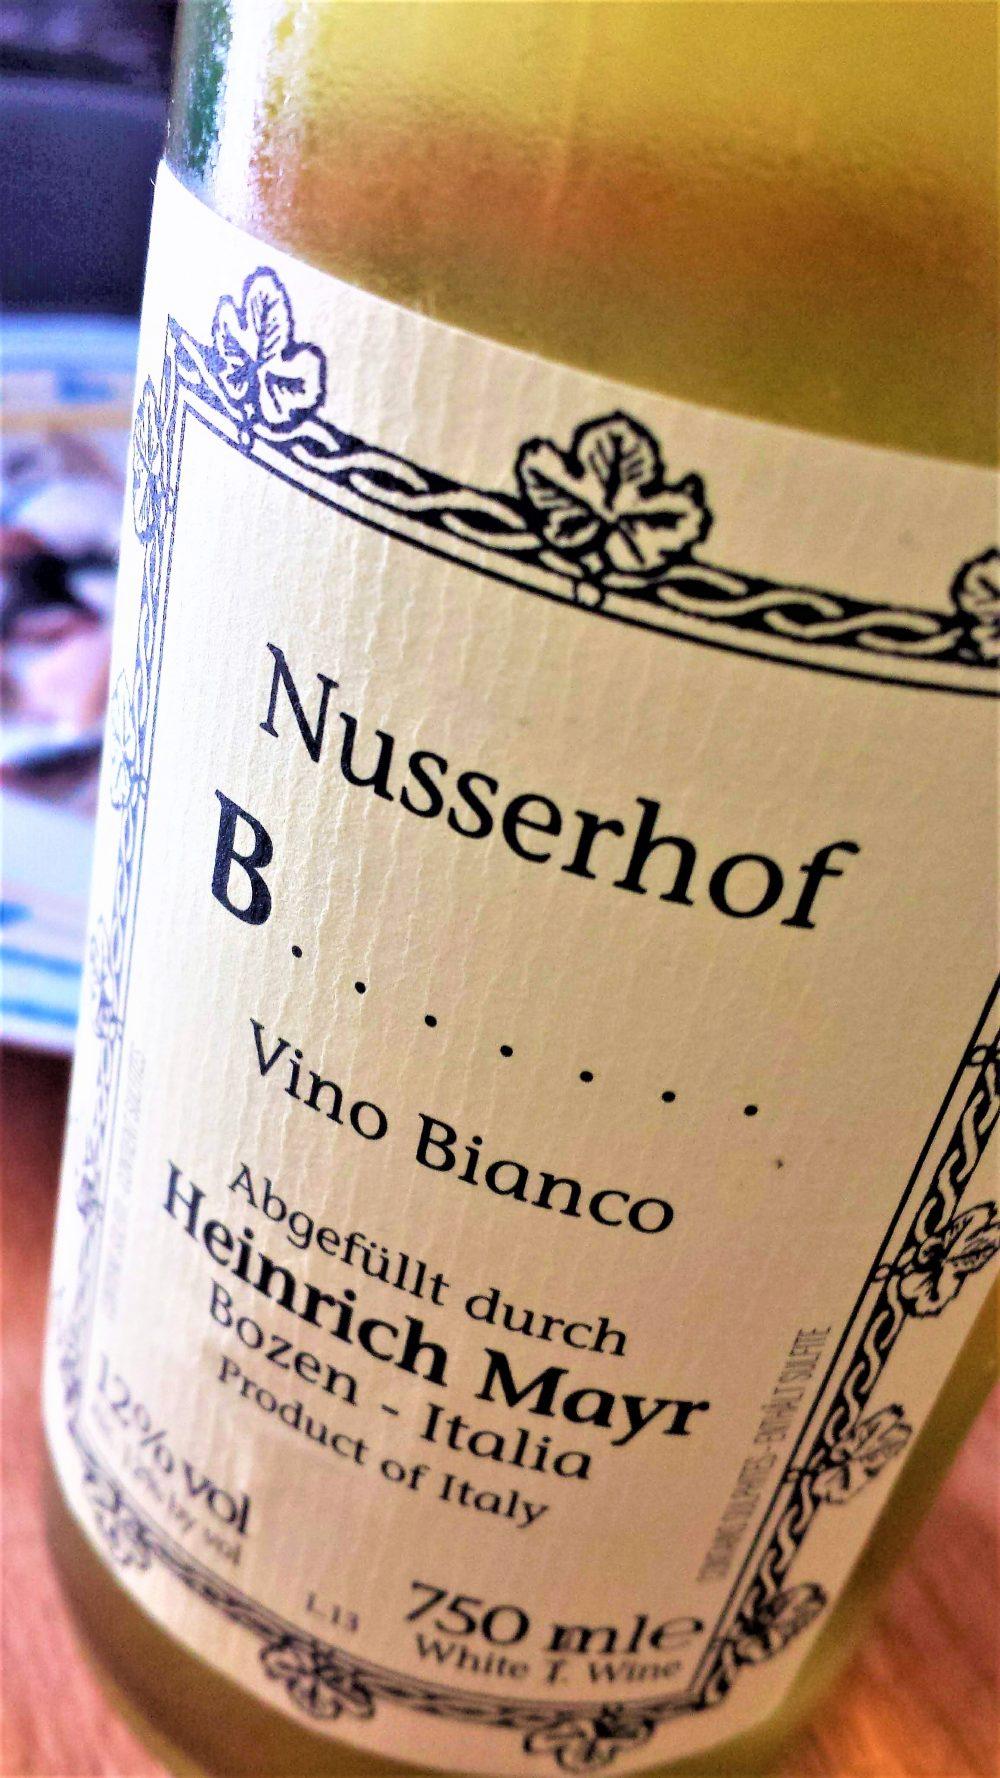 Vino Bianco B......, Nusserhof